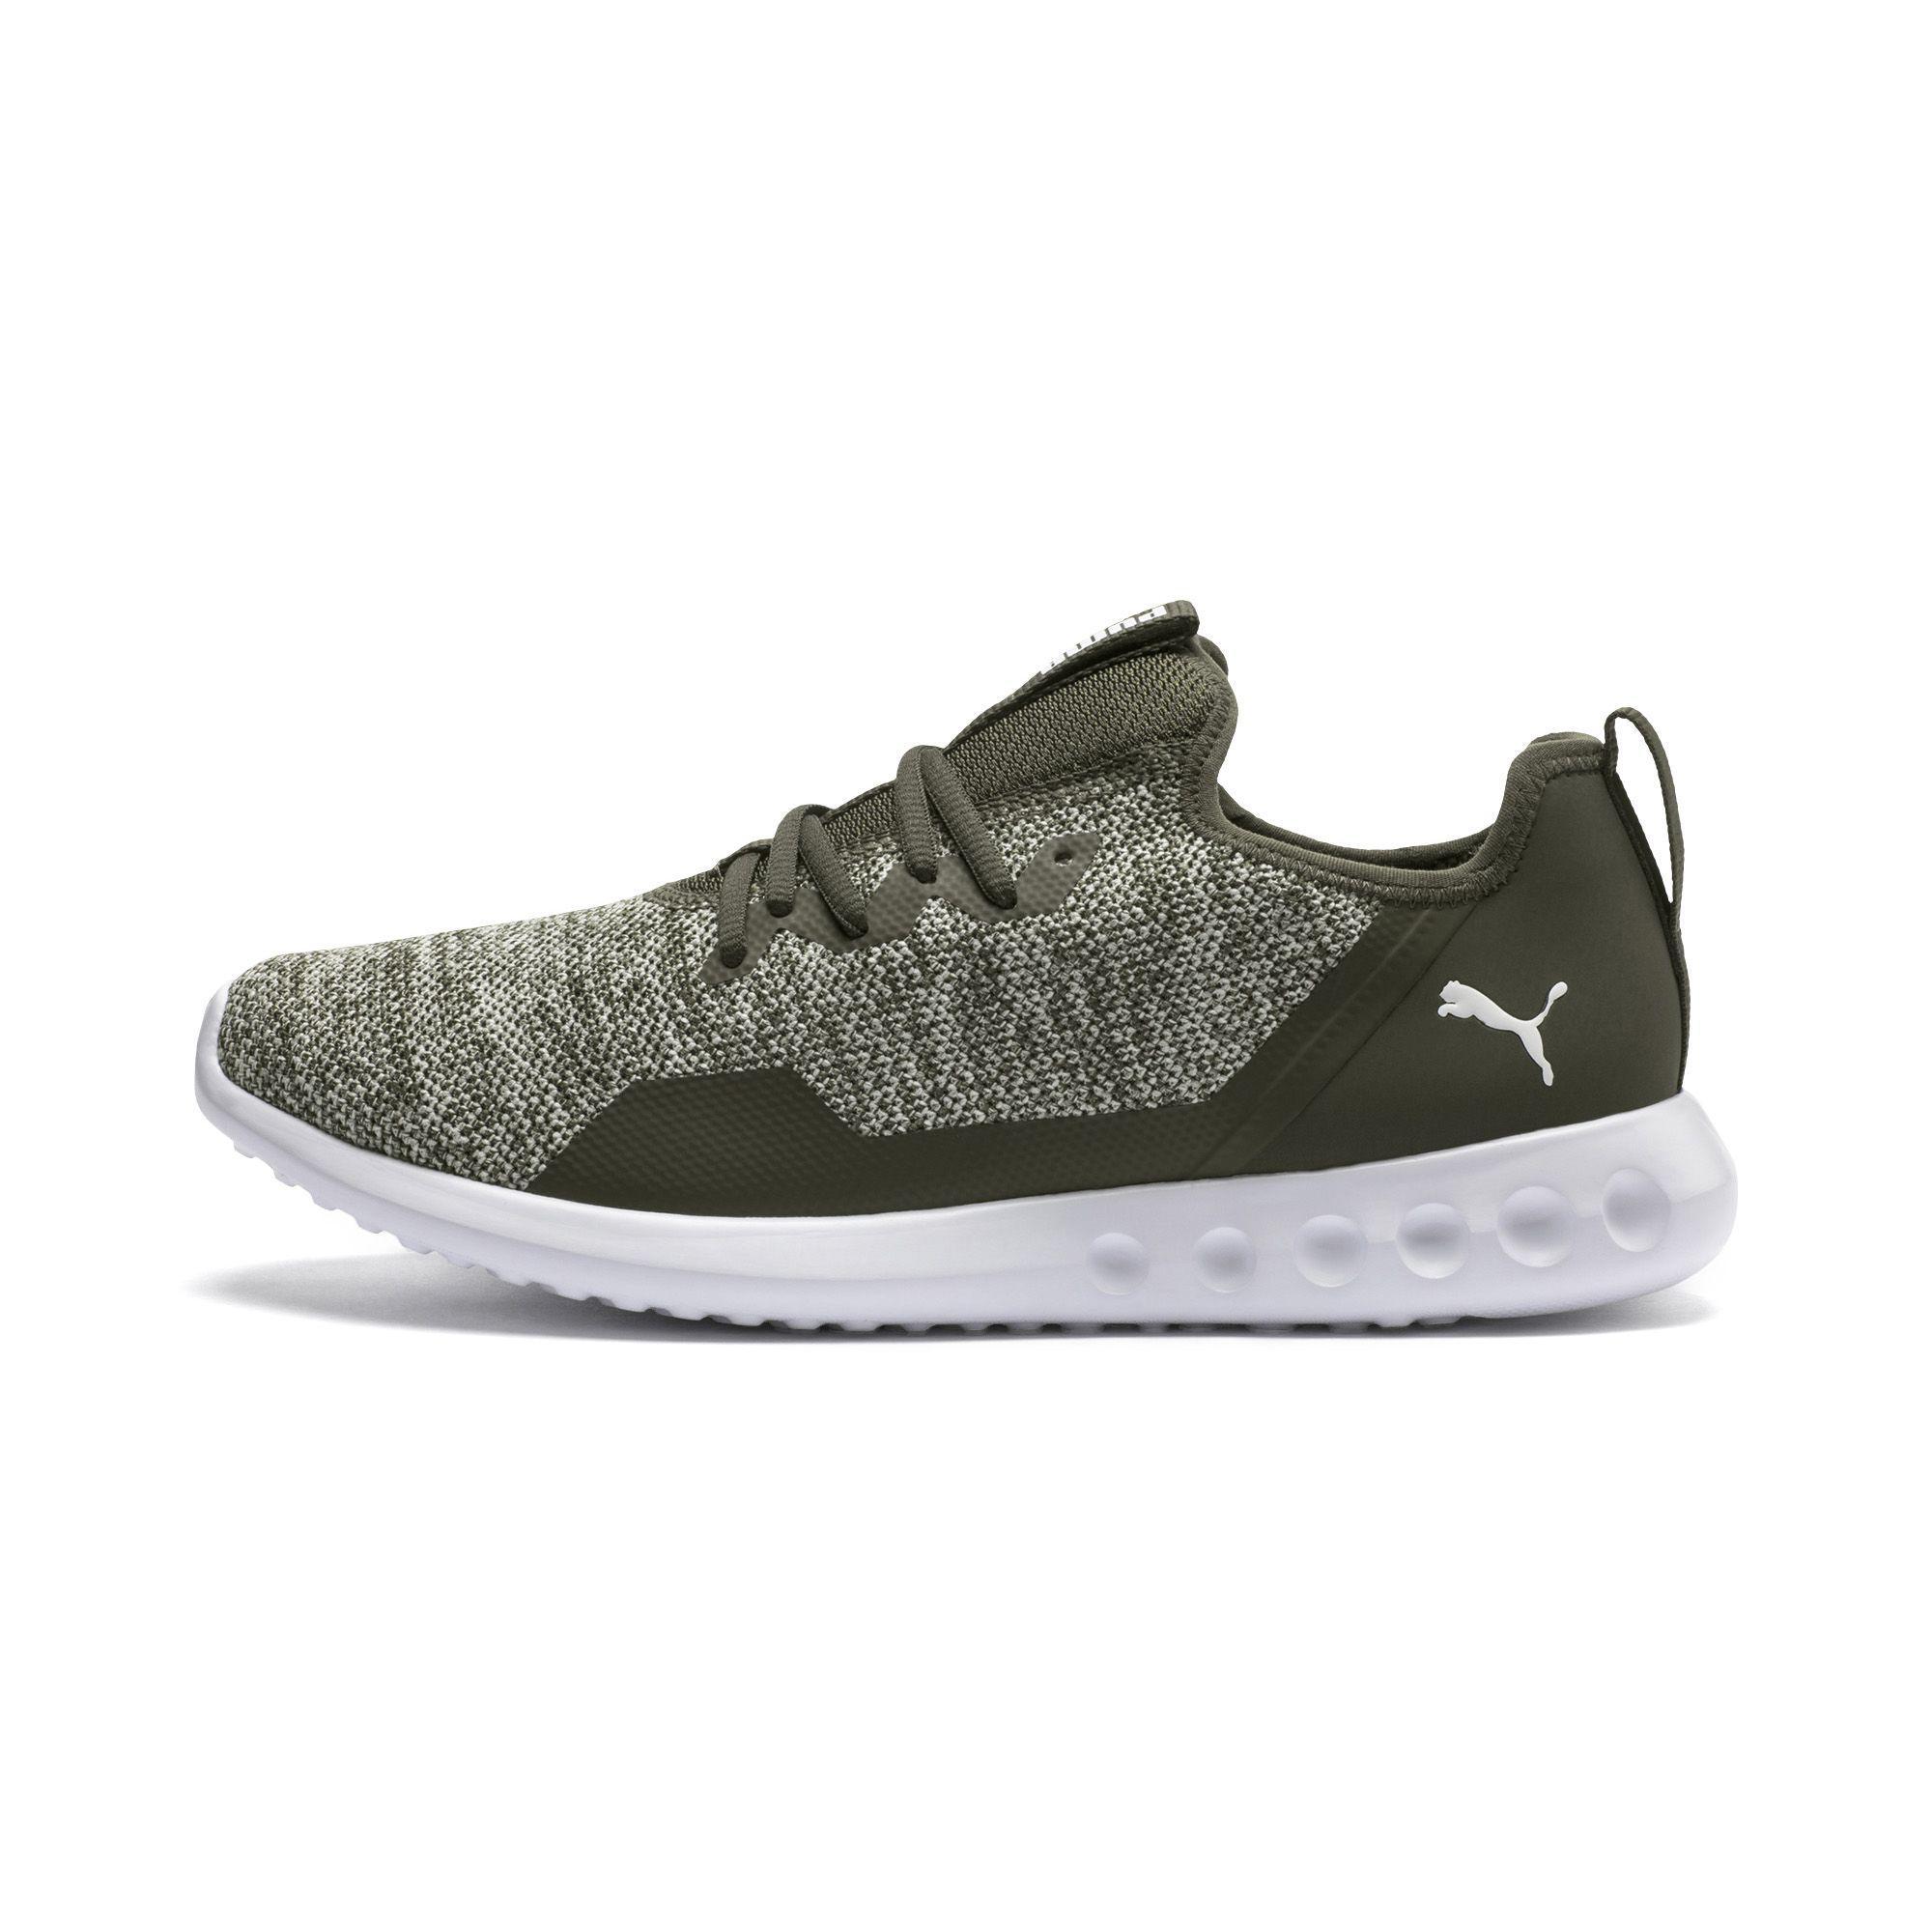 Lyst - PUMA Carson 2 X Knit Men s Running Shoes for Men fb0fea3fd